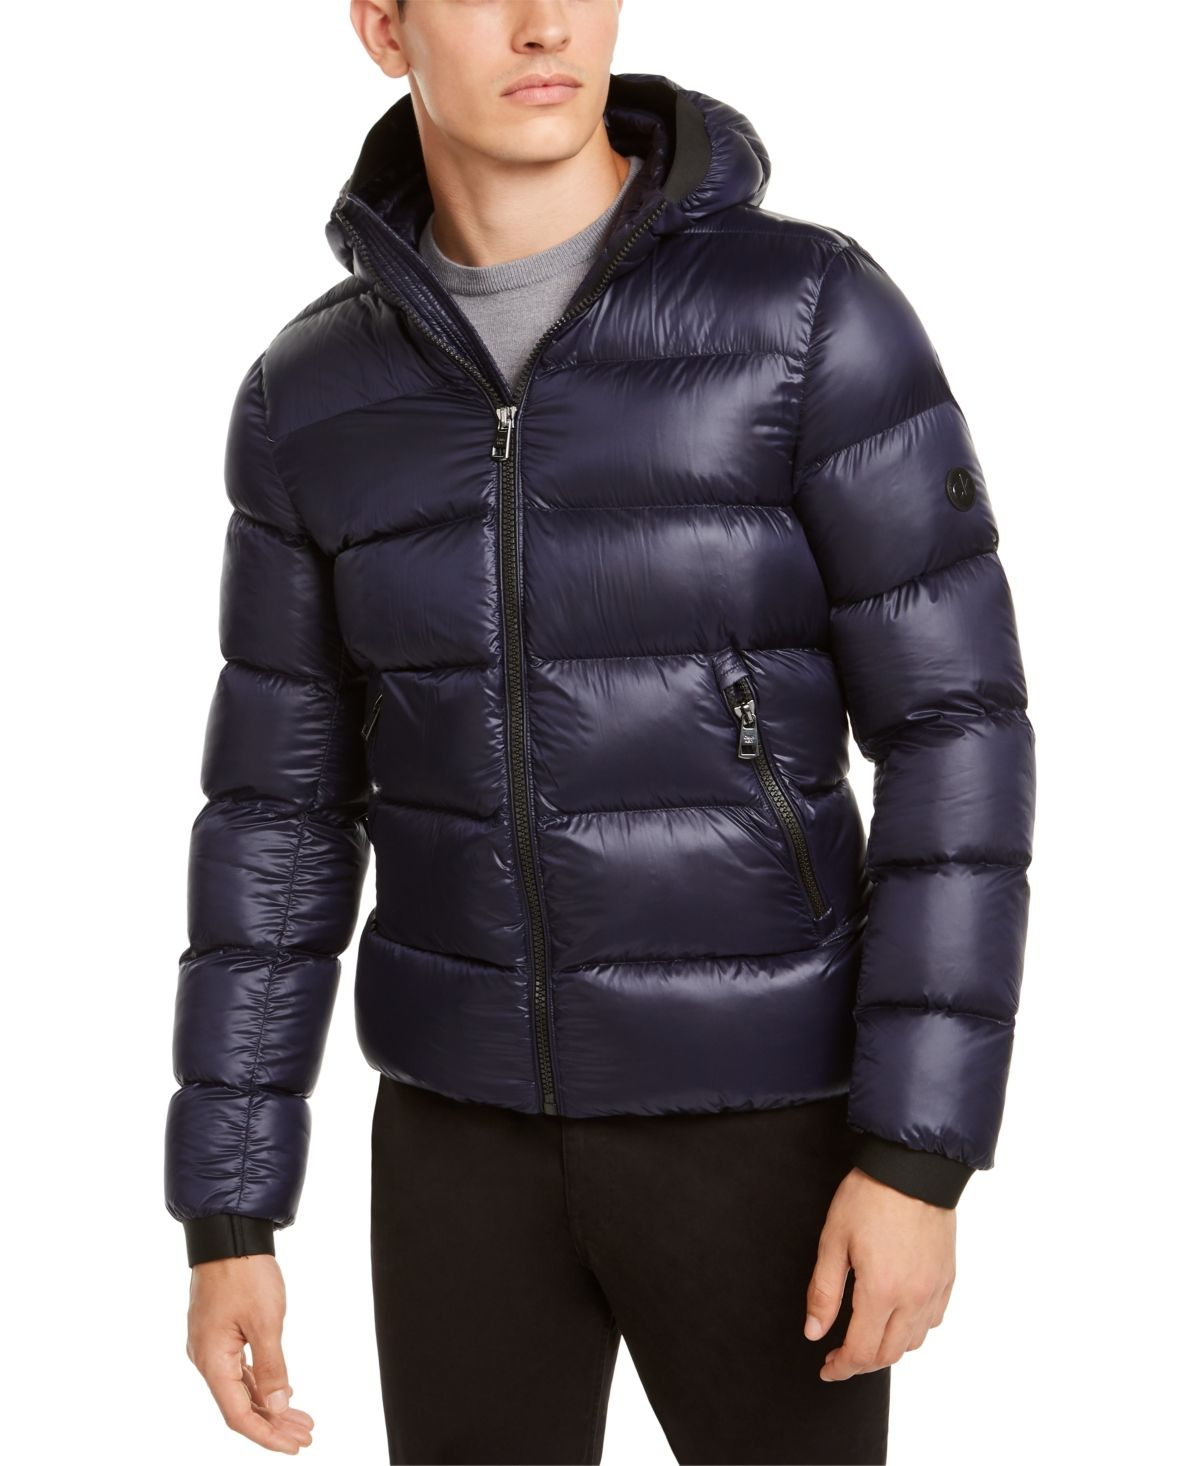 Calvin Klein Men S Slim Fit Hooded Water Resistant Down Jacket Reviews Coats Jackets Men Macy S Slim Fit Men Calvin Klein Men Slim Man [ 1466 x 1200 Pixel ]